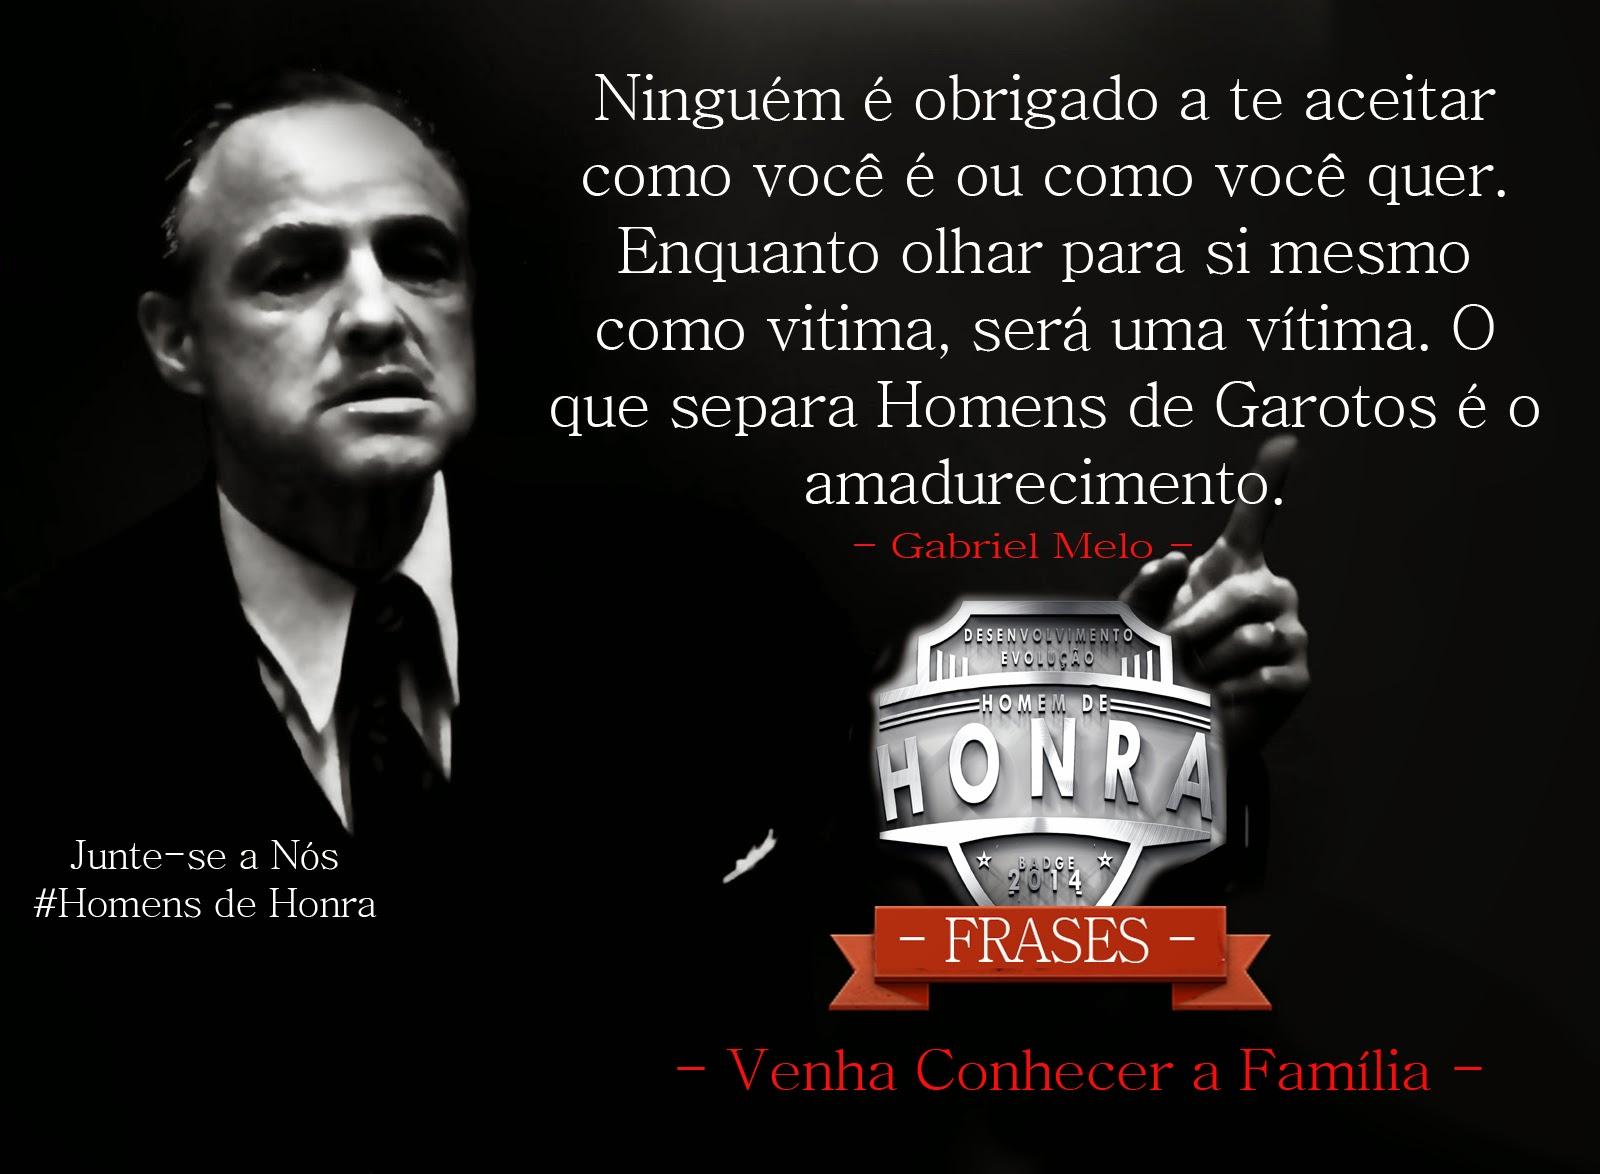 Frase Da Semana Por Gabriel Melo Clube Da Honra